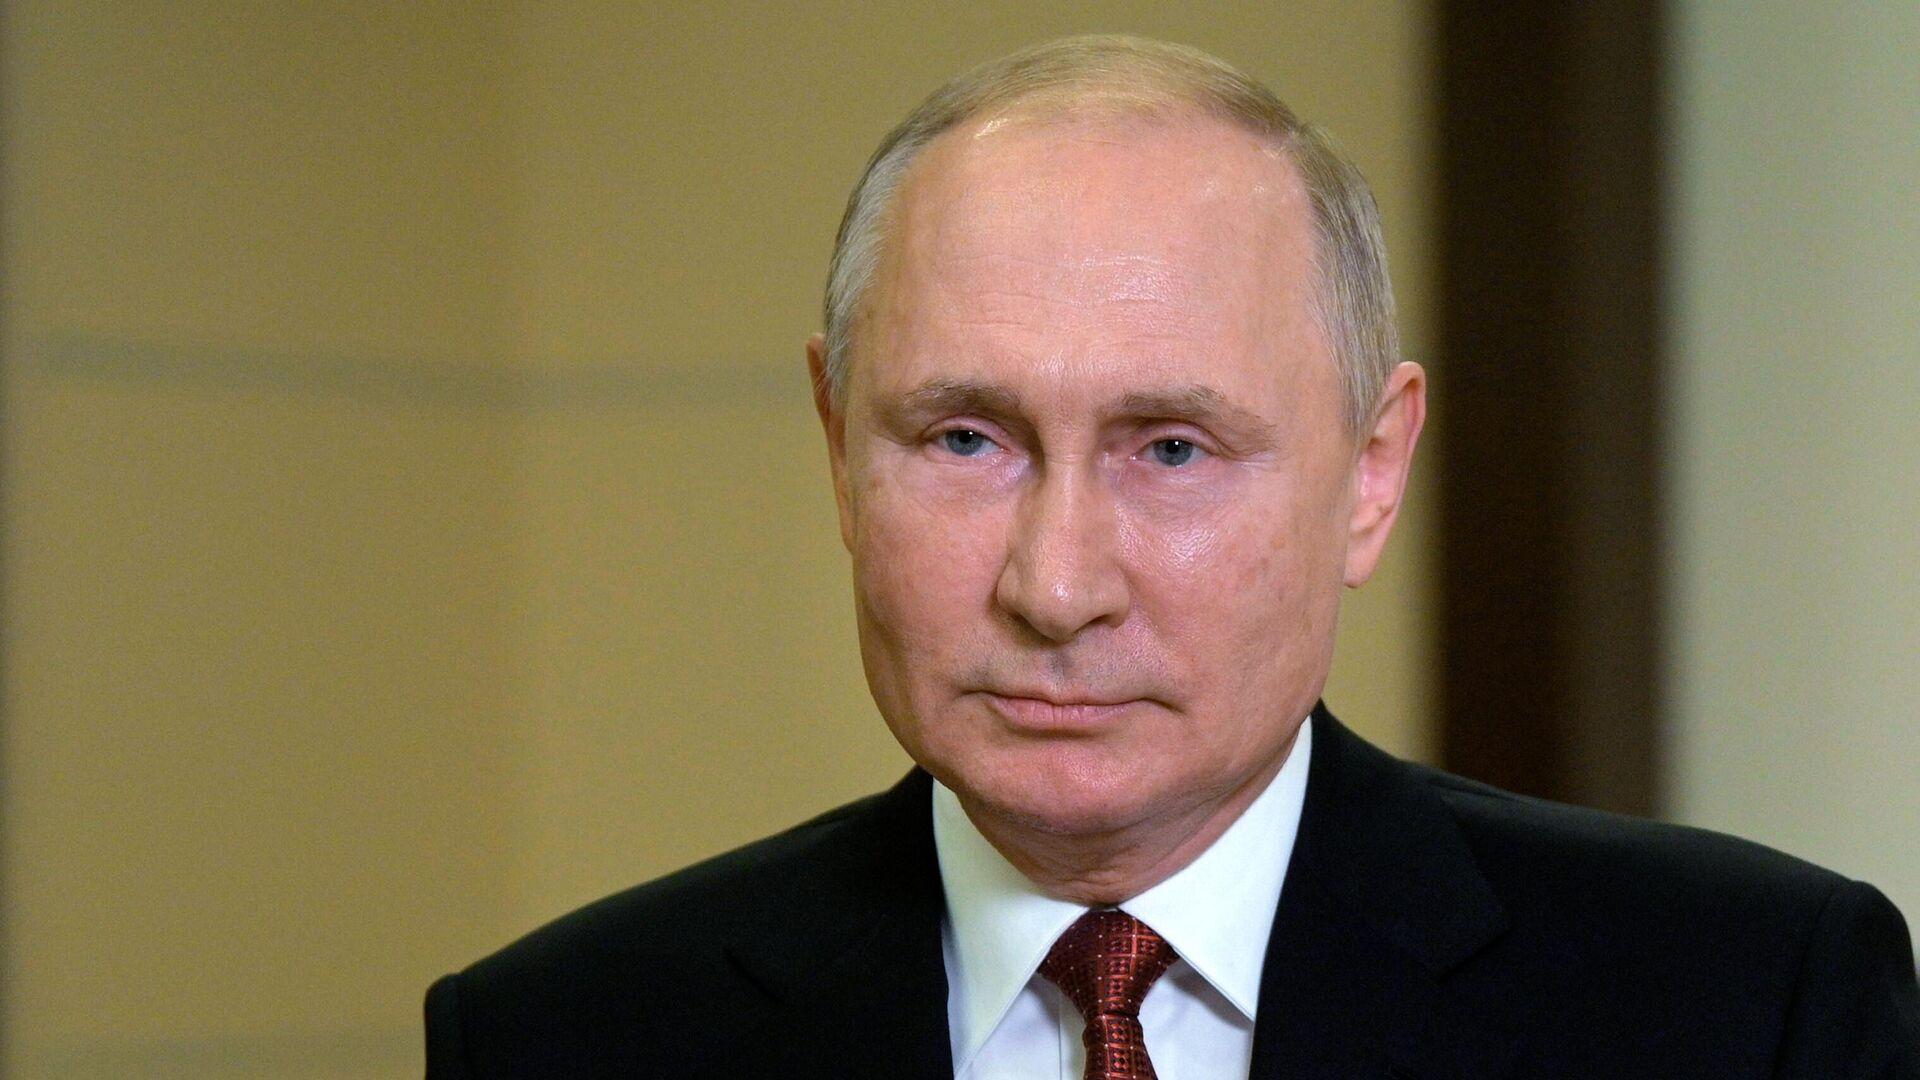 1750263911 0:28:3038:1737 1920x0 80 0 0 7a2620fbc0238739ad42809ea9d0981f - Путин: переезд штаб-квартиры Газпрома в Петербург даст городу миллиарды рублей доходов